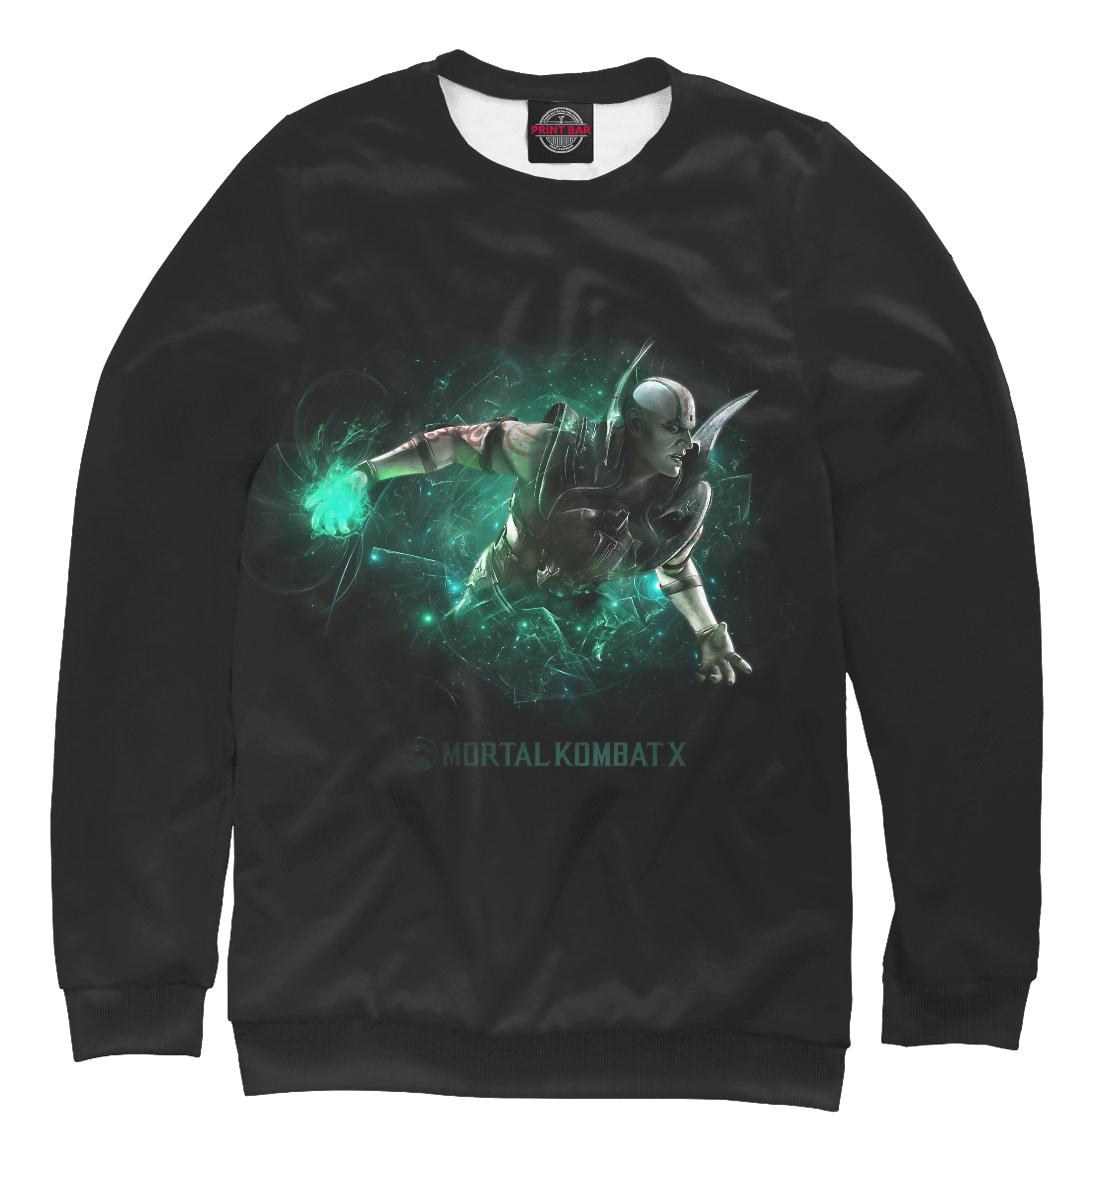 Купить Mortal Kombat (Quan Chi), Printbar, Свитшоты, MKB-326686-swi-2